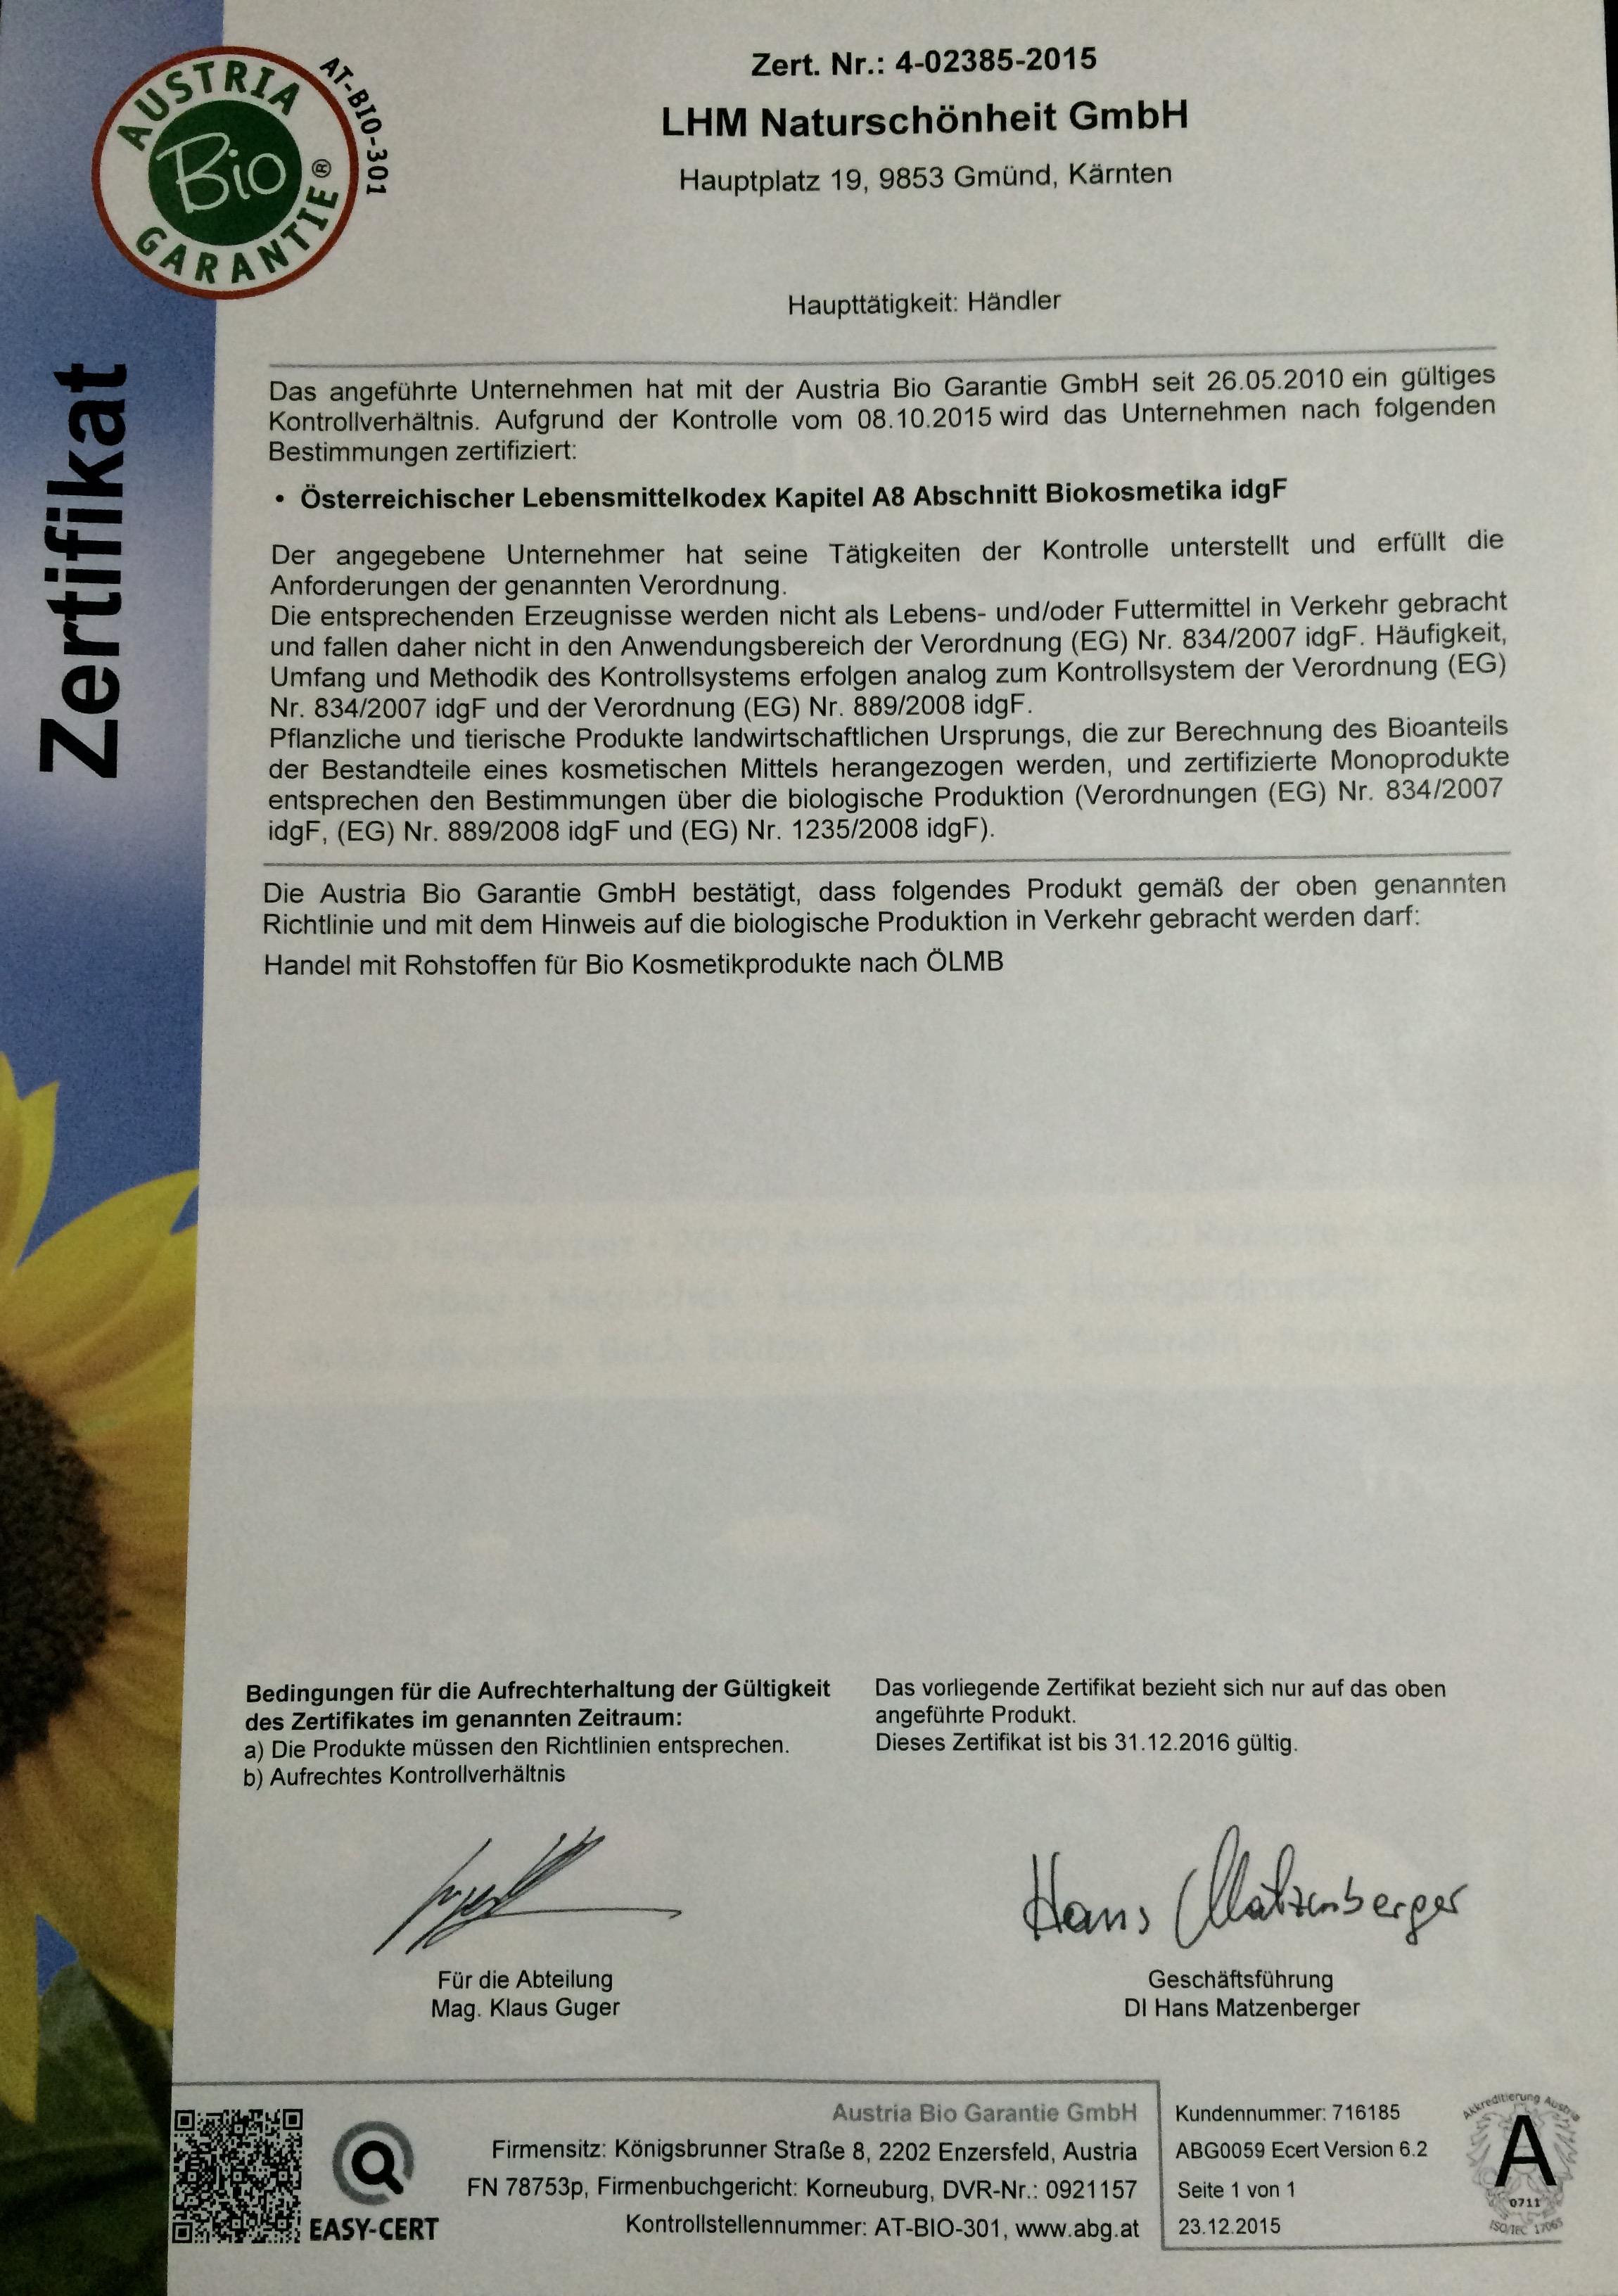 Zertifikat-Rohstoffe-jpg